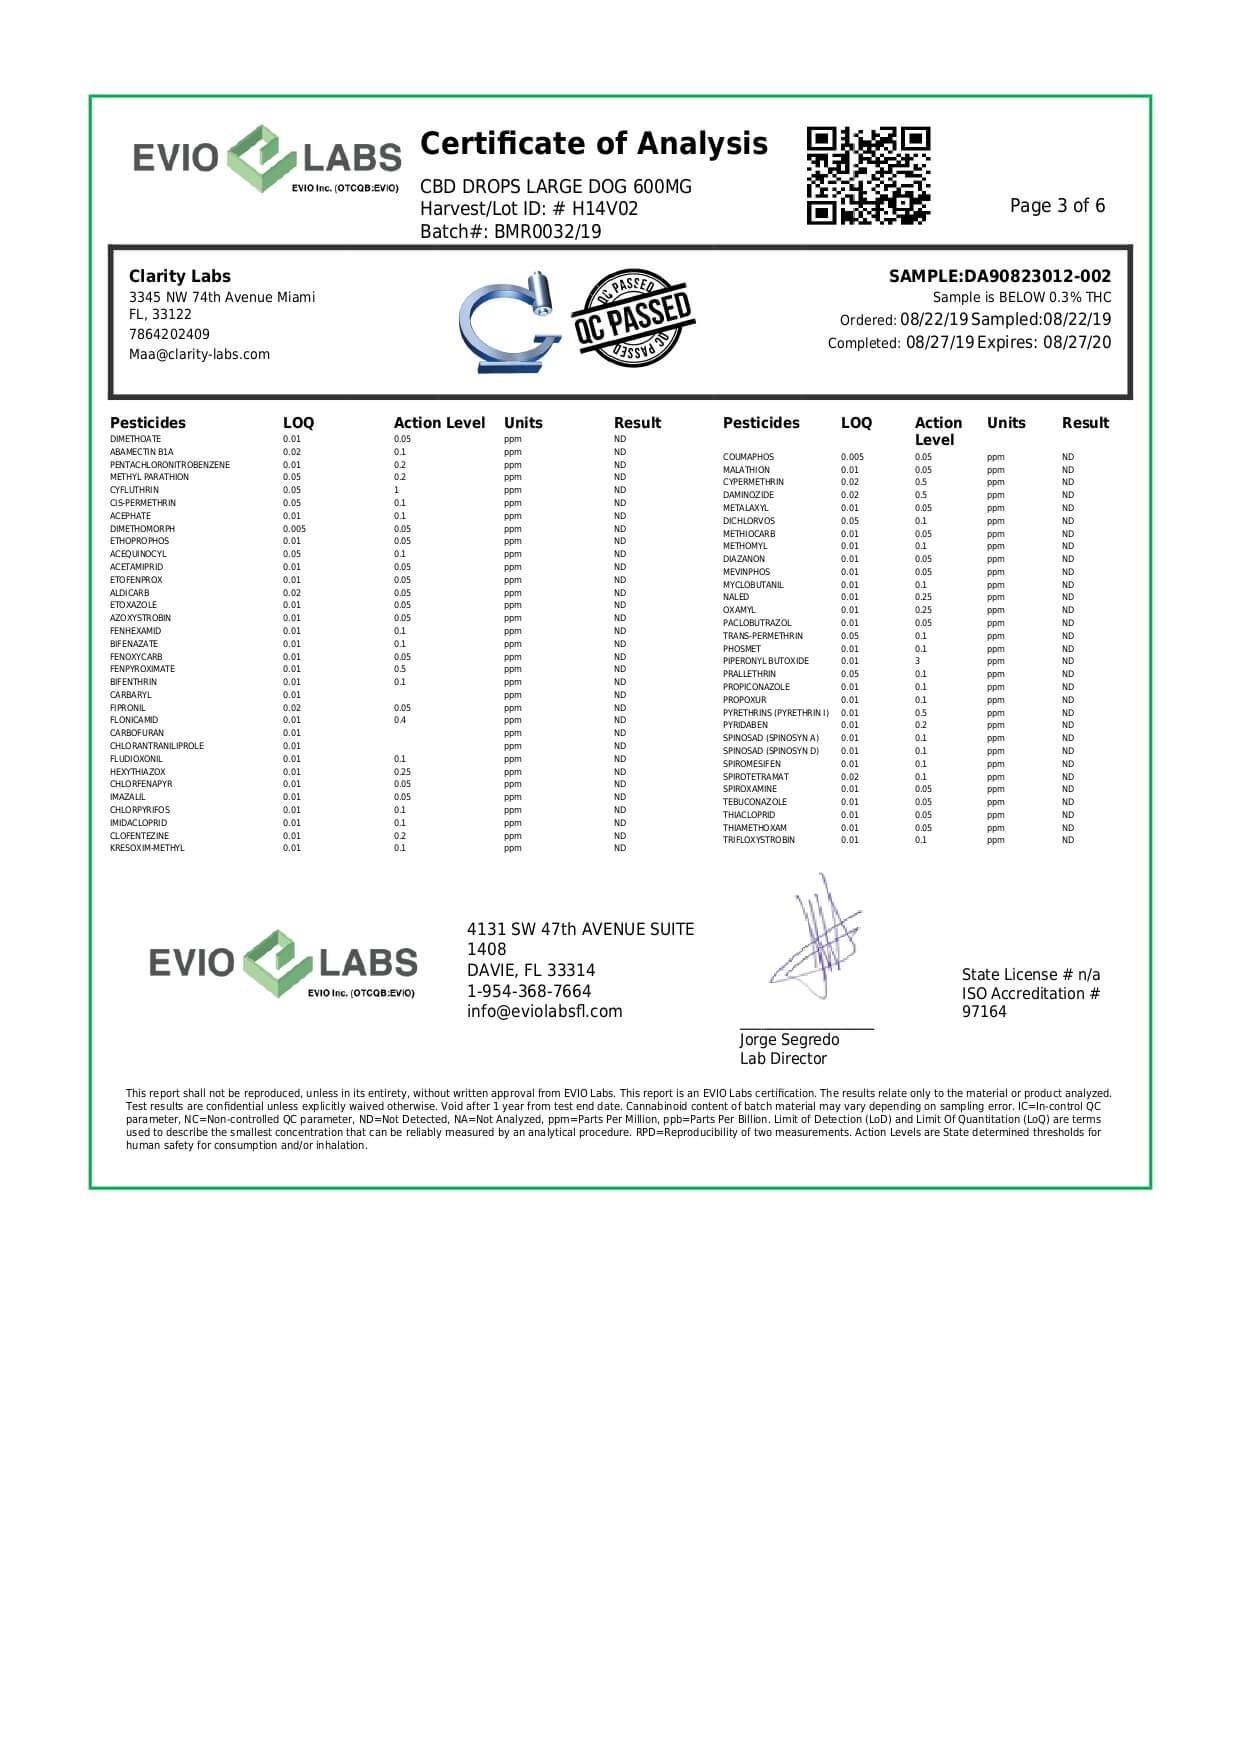 Green Roads CBD Pet Tincture CBD Drops Dog Formula 600mg Lab Report